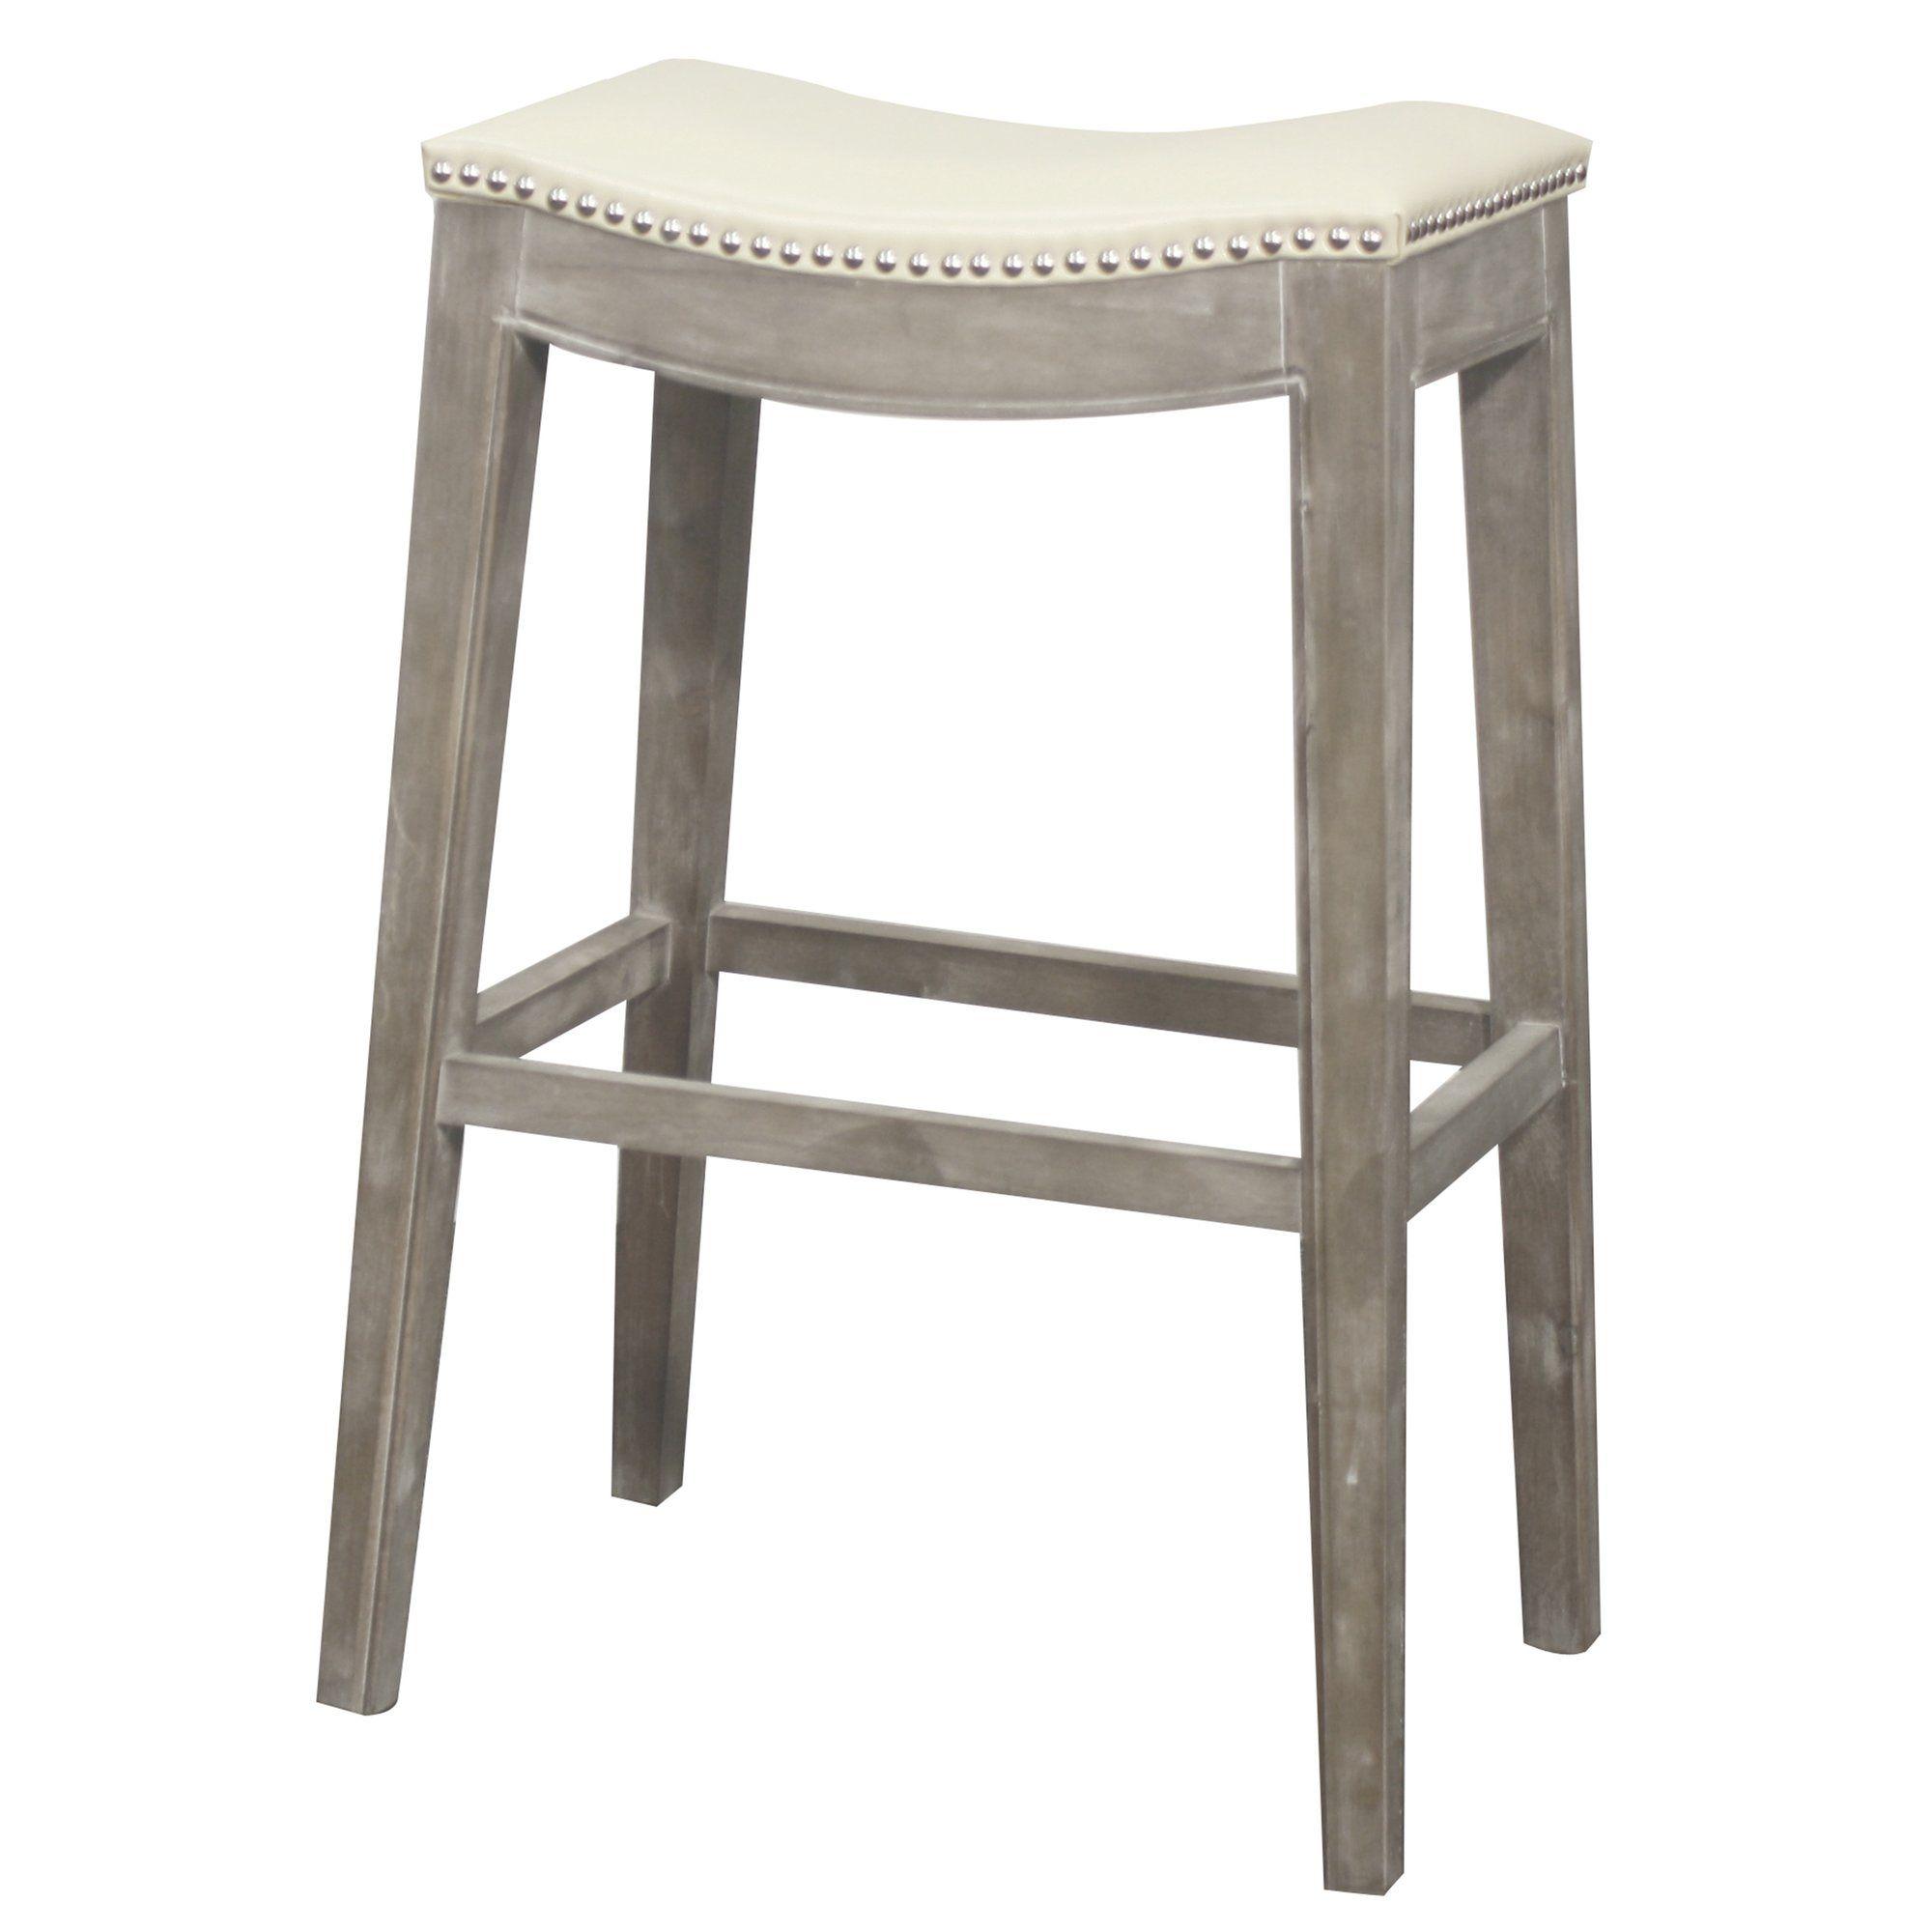 Customer Image Zoomed Leather bar stools, Bar stools